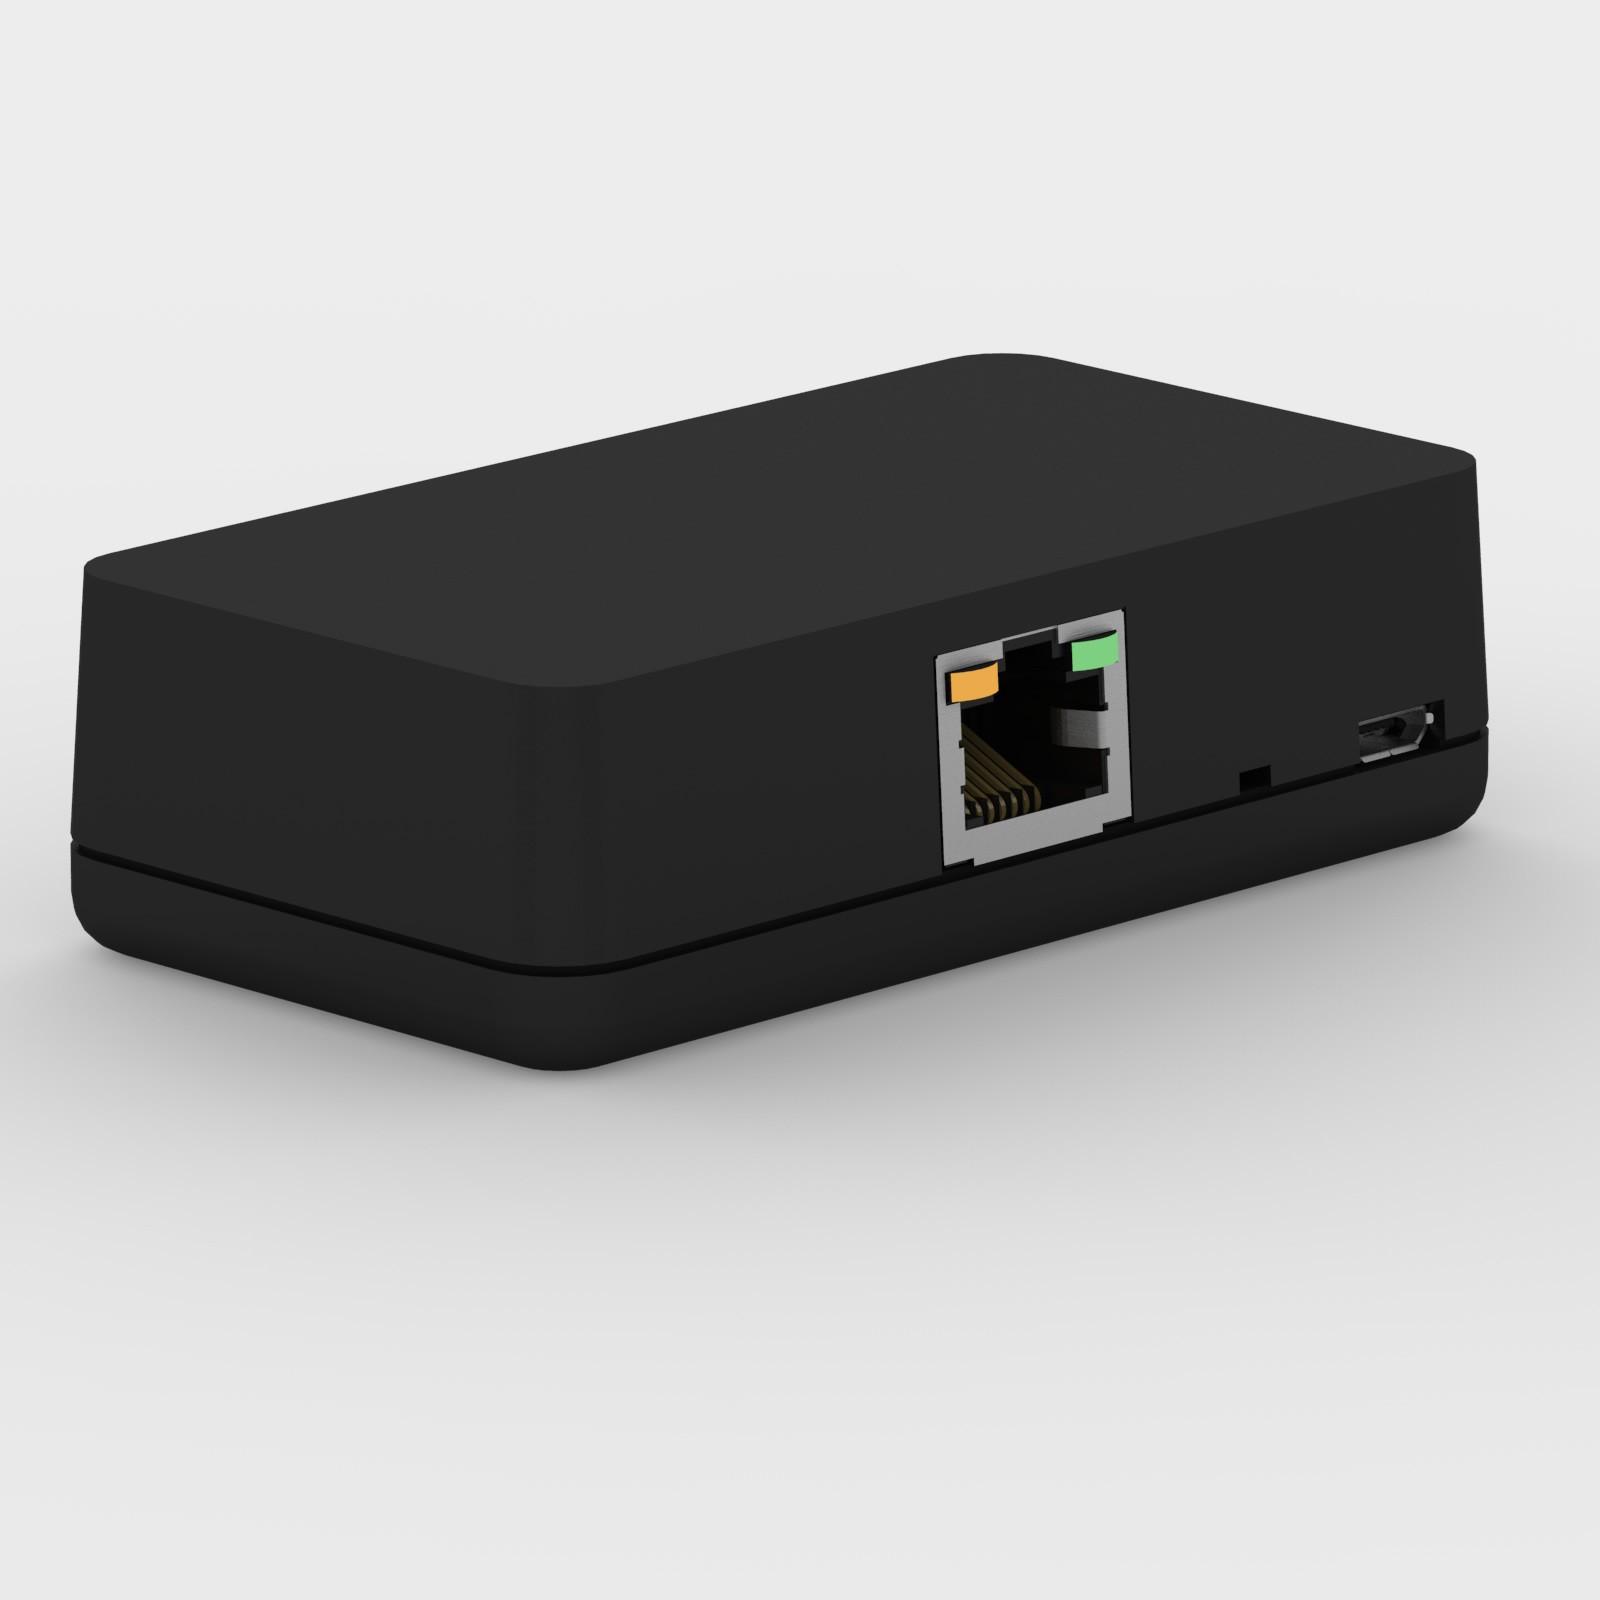 Redpark Gigabit Poe Adapter For Ipad Data And Power